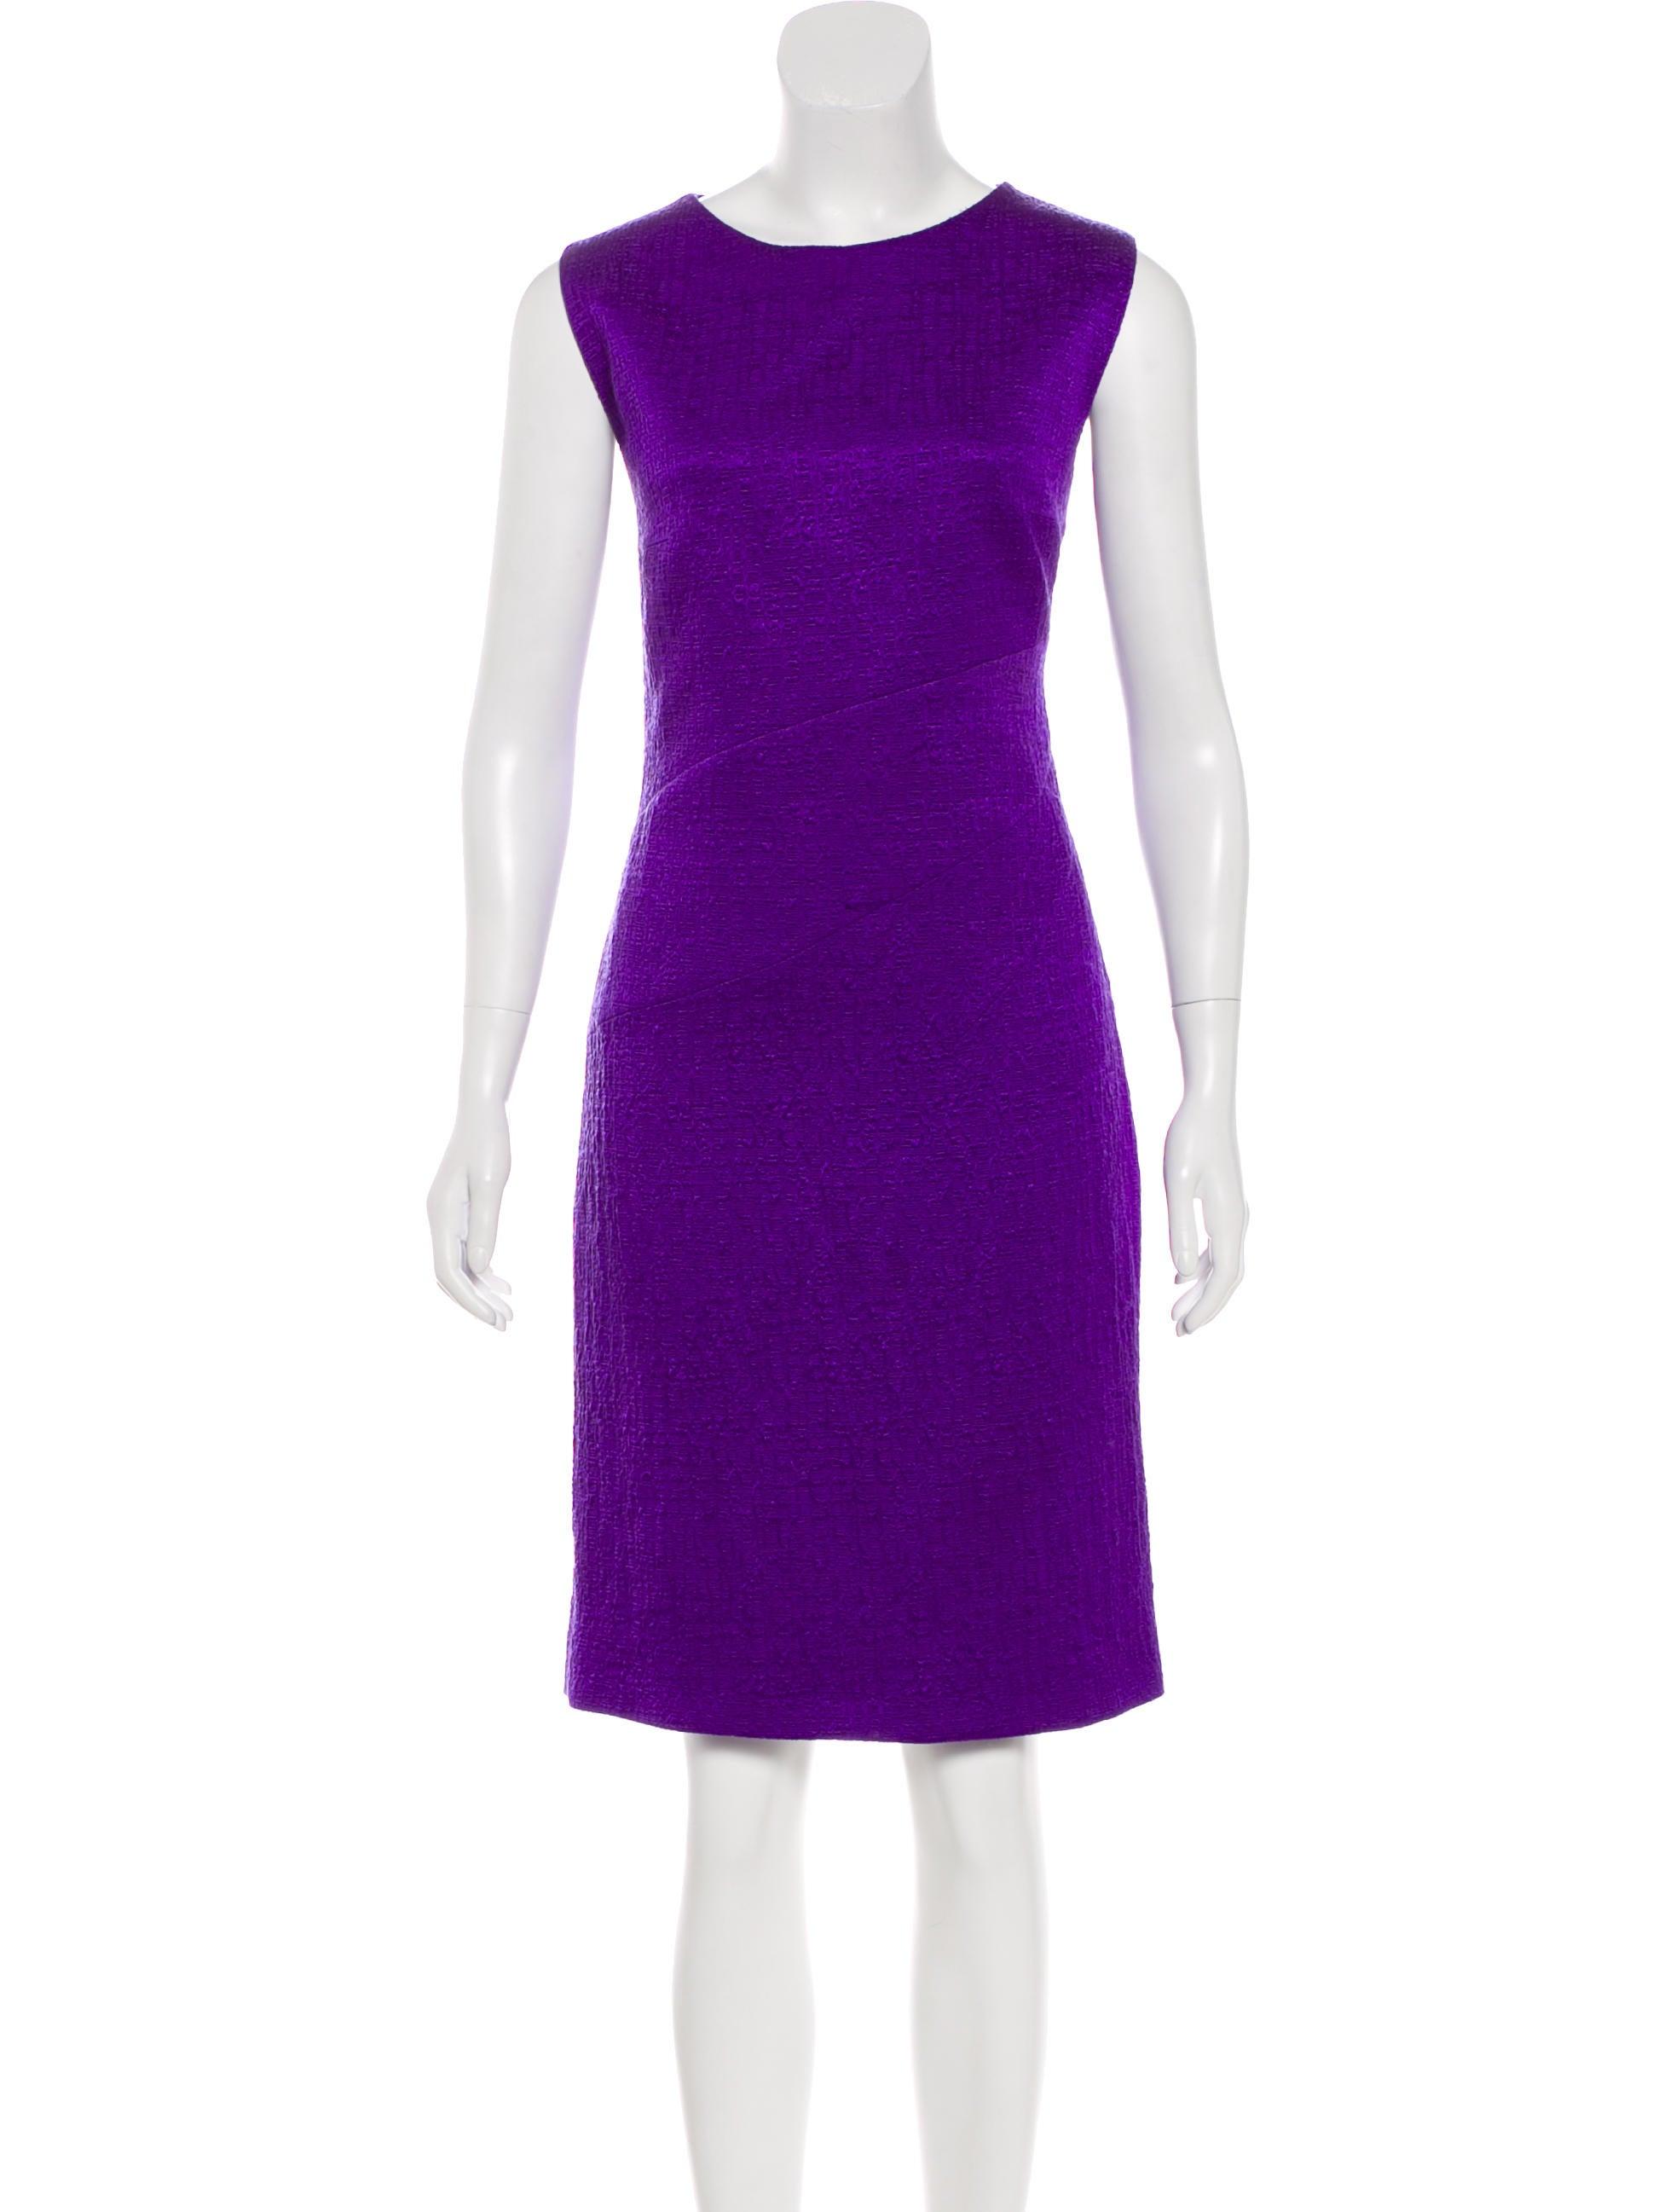 Oscar de la Renta Textured Sheath Dress - Clothing - OSC69749 | The ...